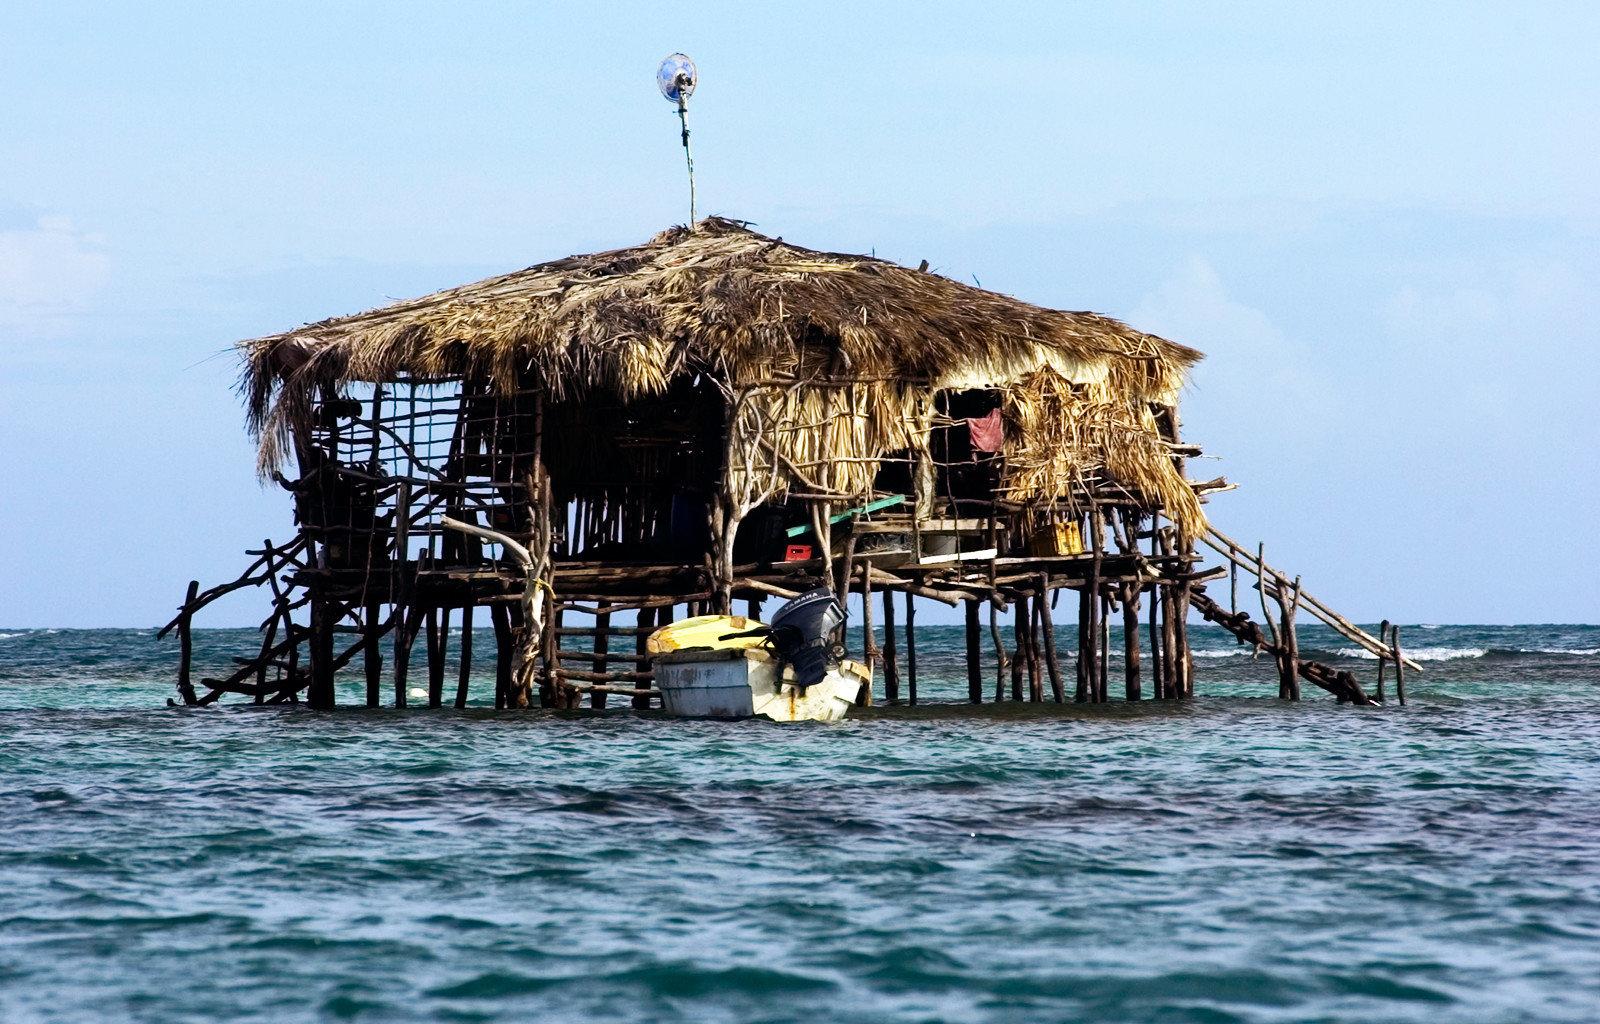 sky water Beach Sea Coast Ocean hut vehicle Island Resort day